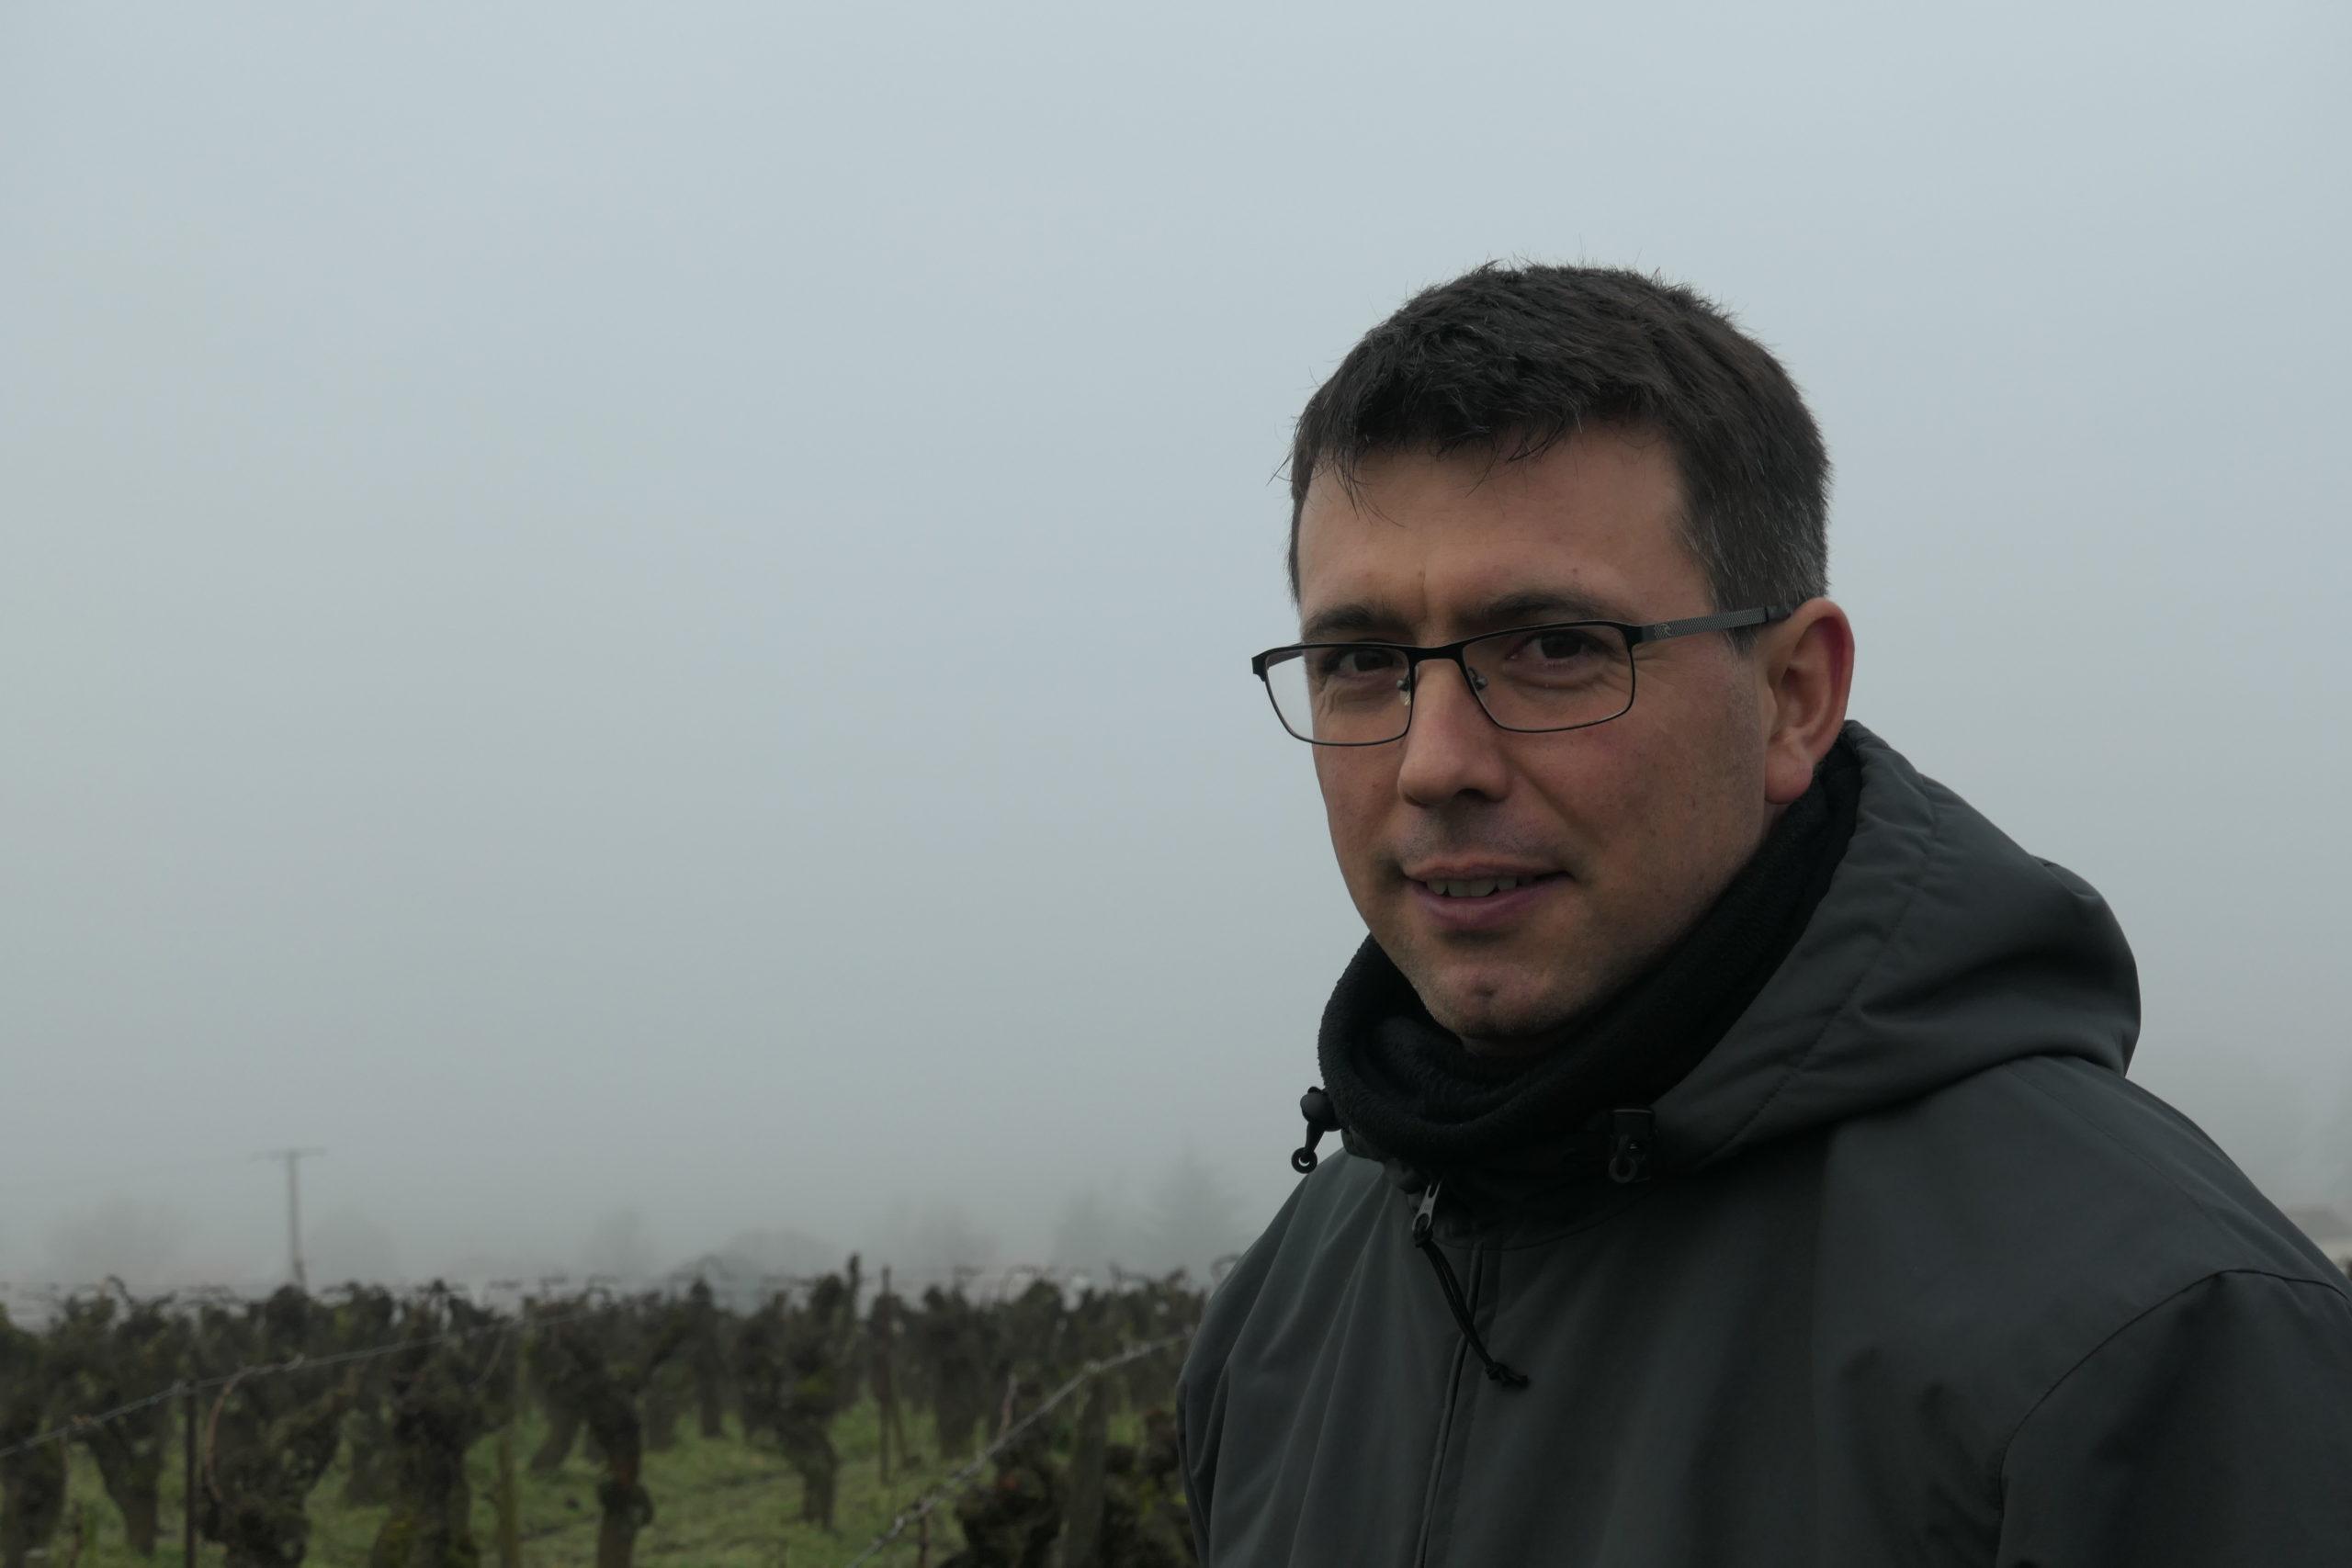 domaine Julien Braud